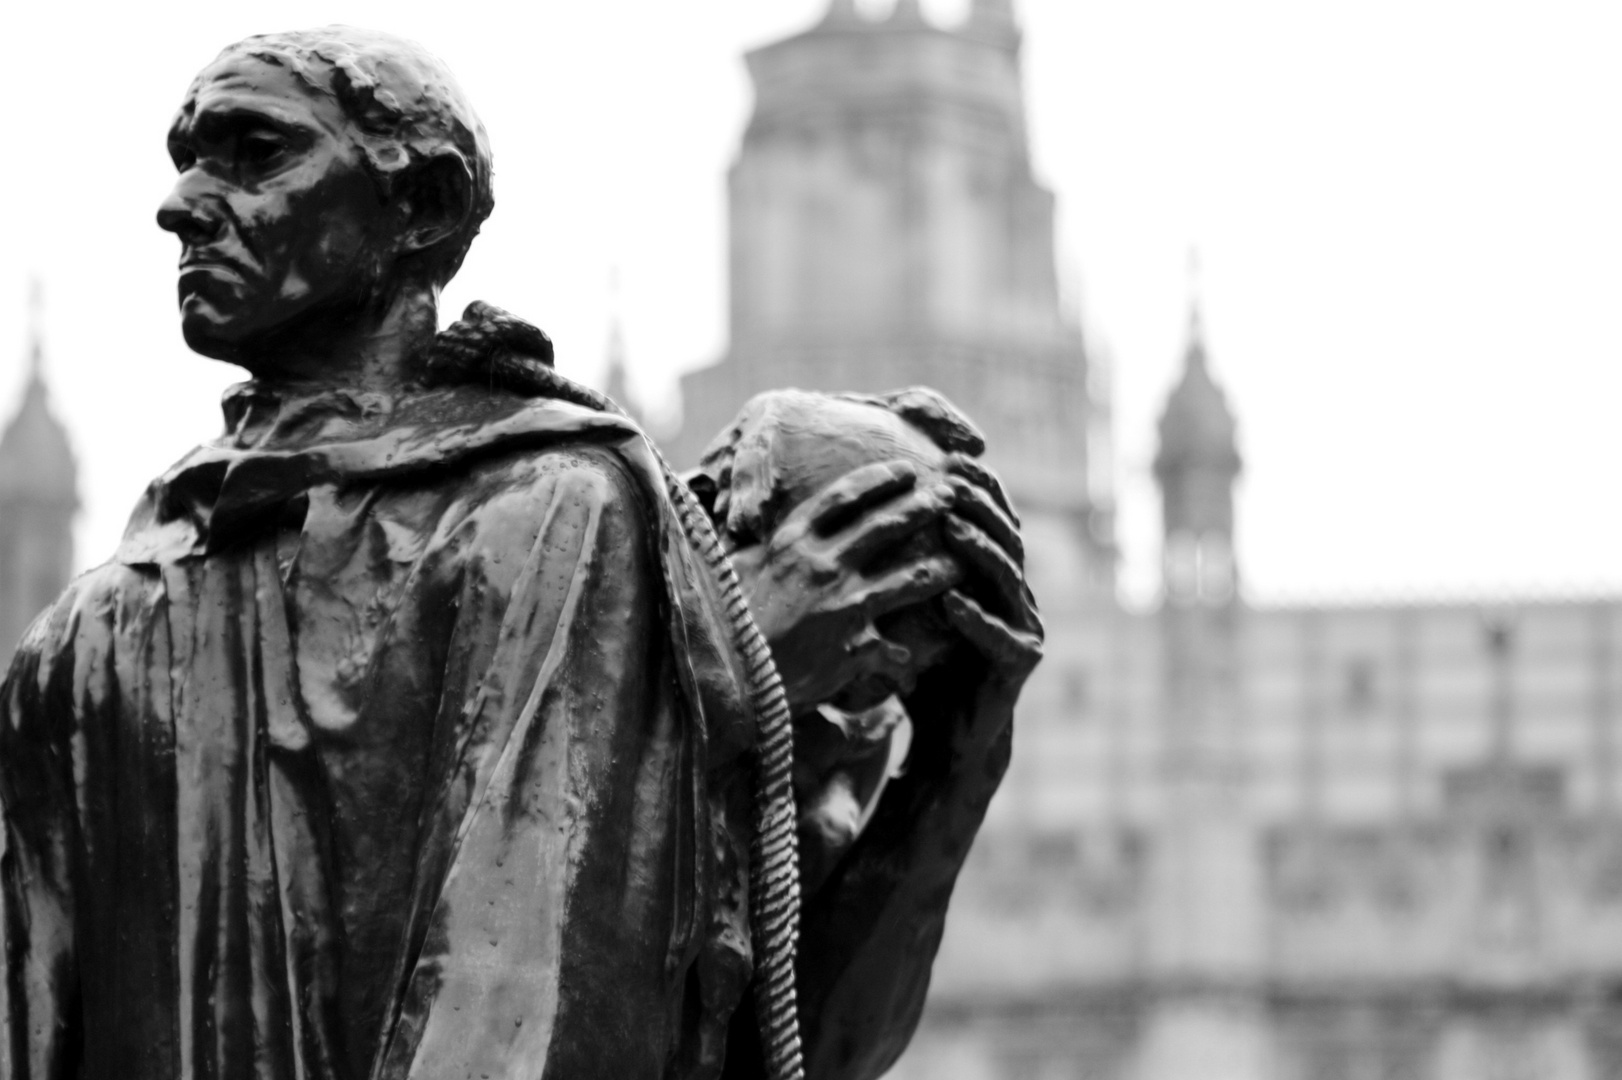 Statue at Victoria Tower Gardens